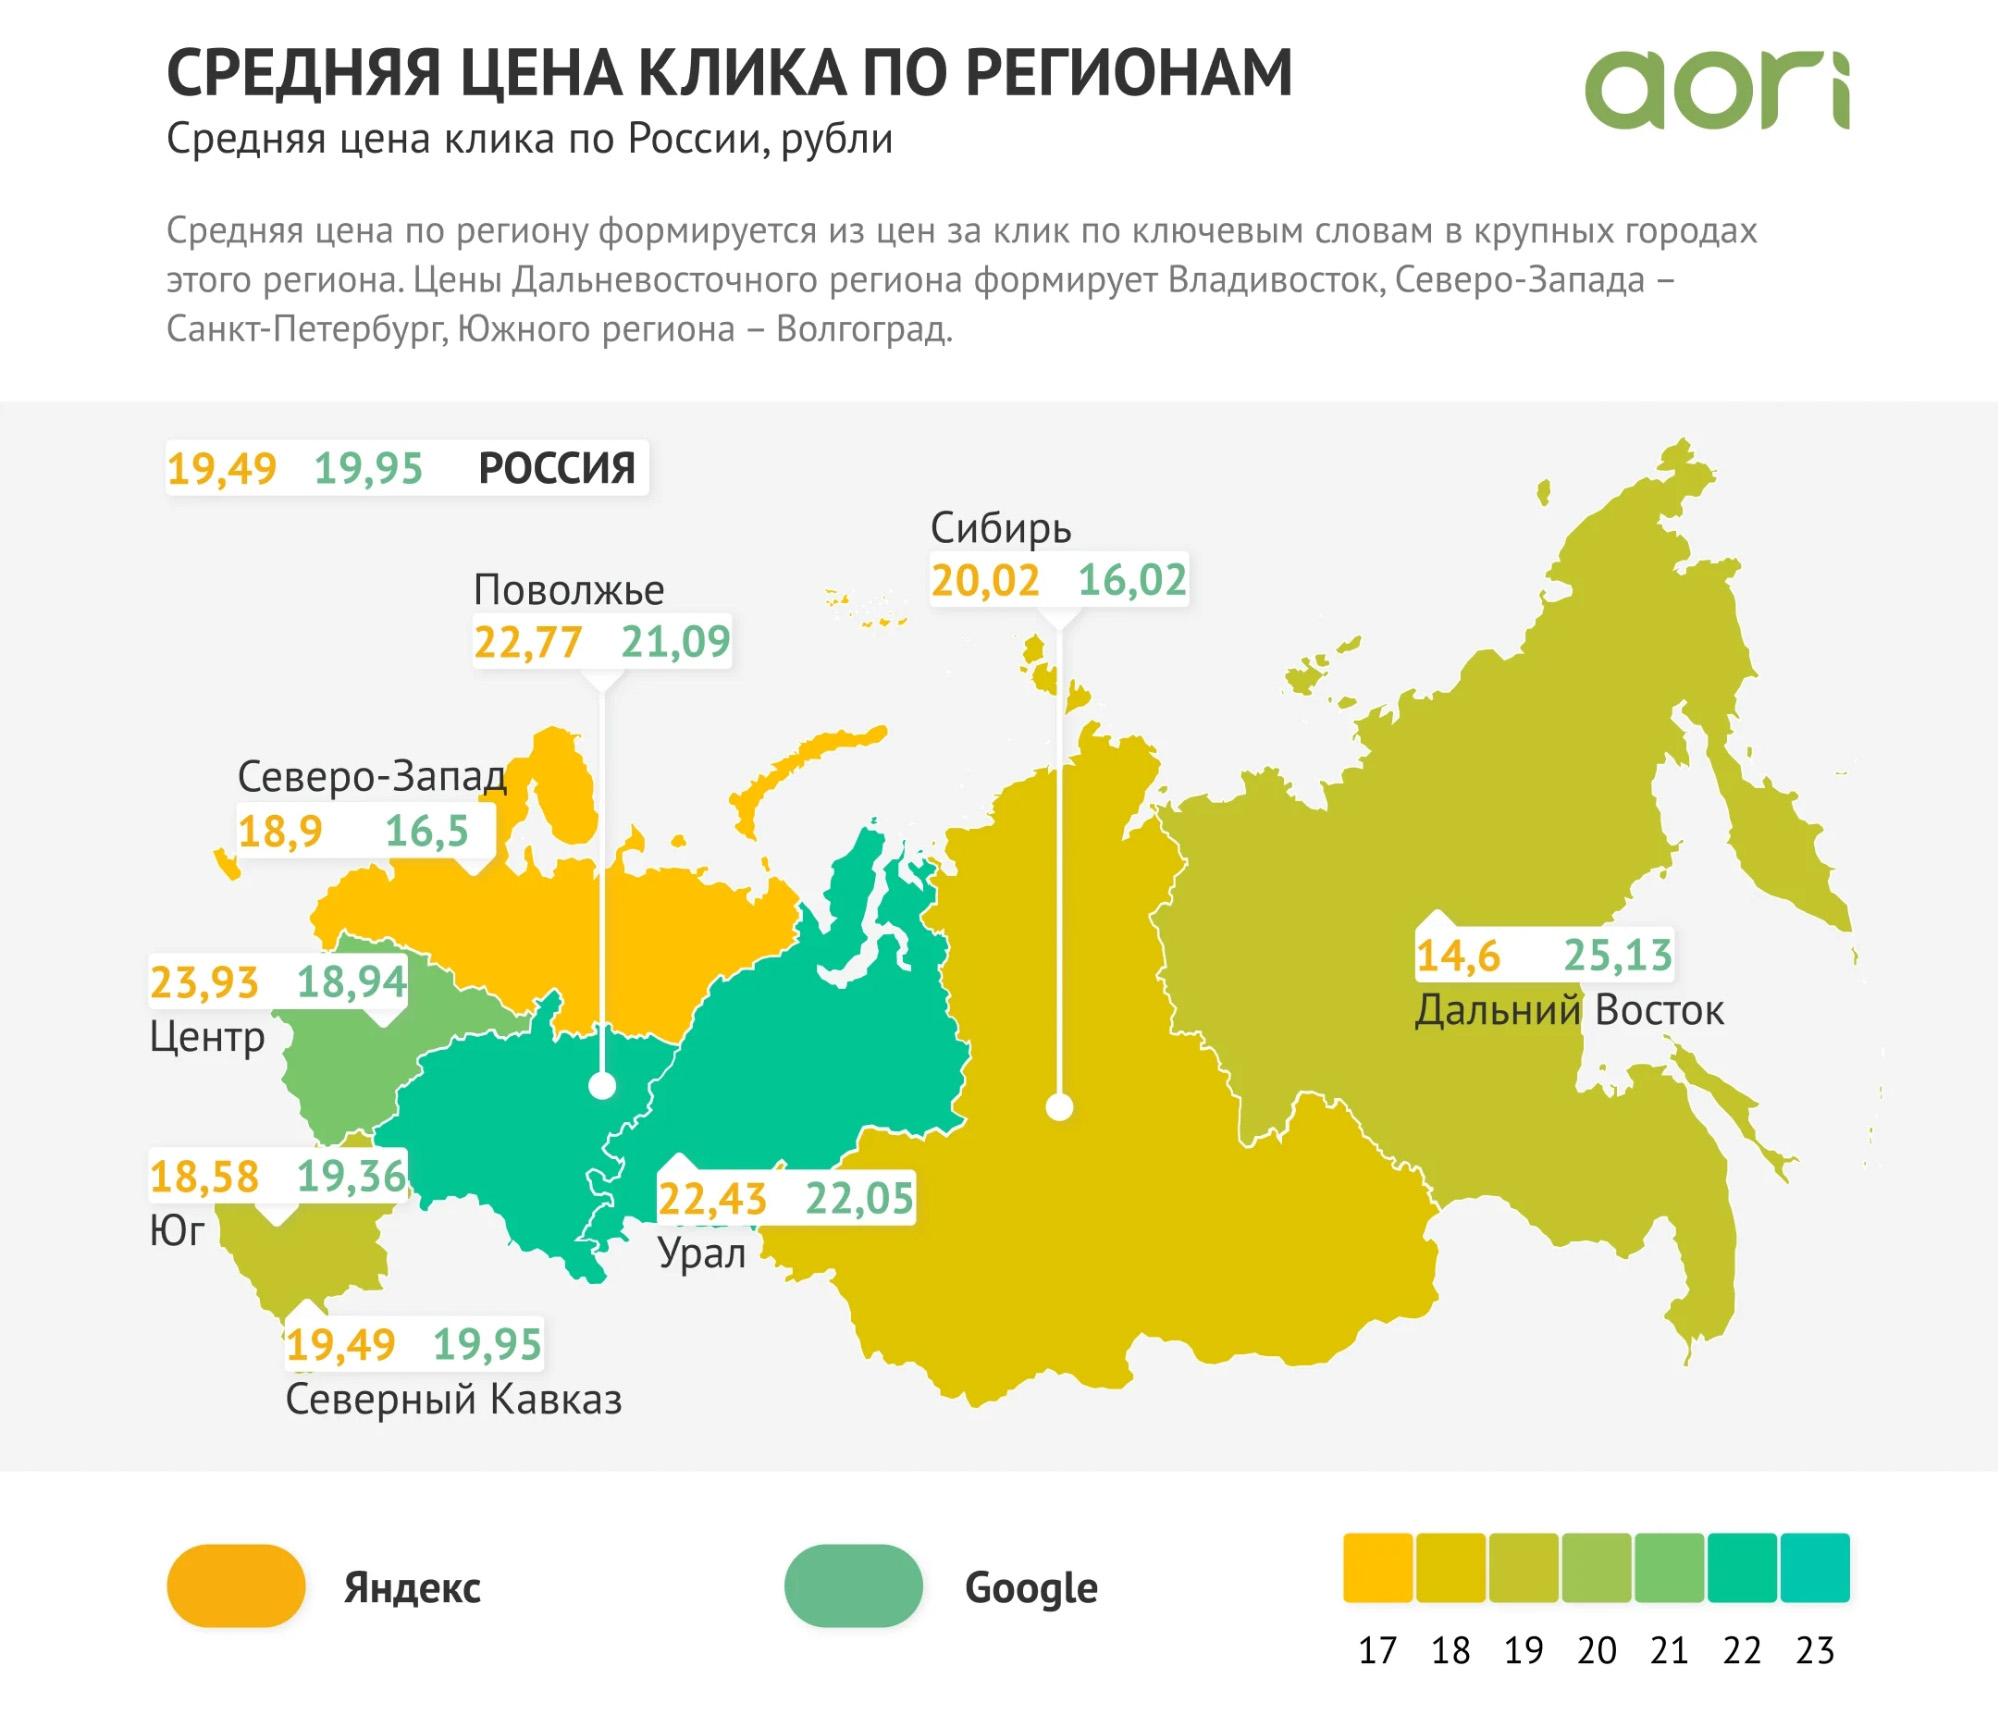 Средняя цена клика по регионам России Яндекс vs Гугл за 2020 год